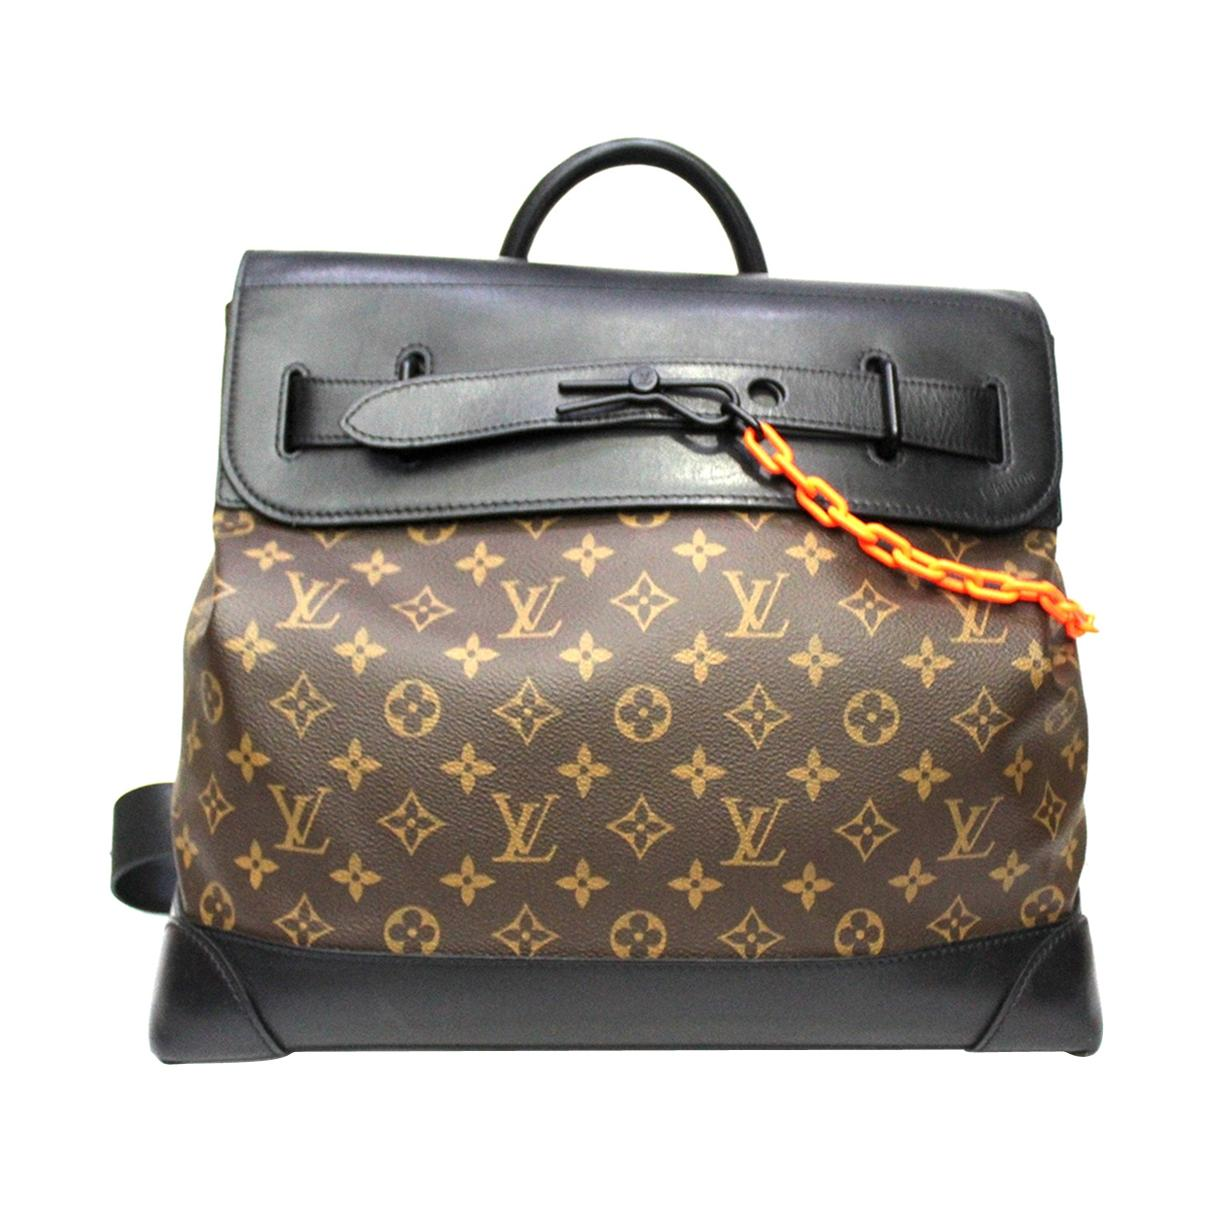 Louis Vuitton Monogram Leather Steamer Shoulder Bag